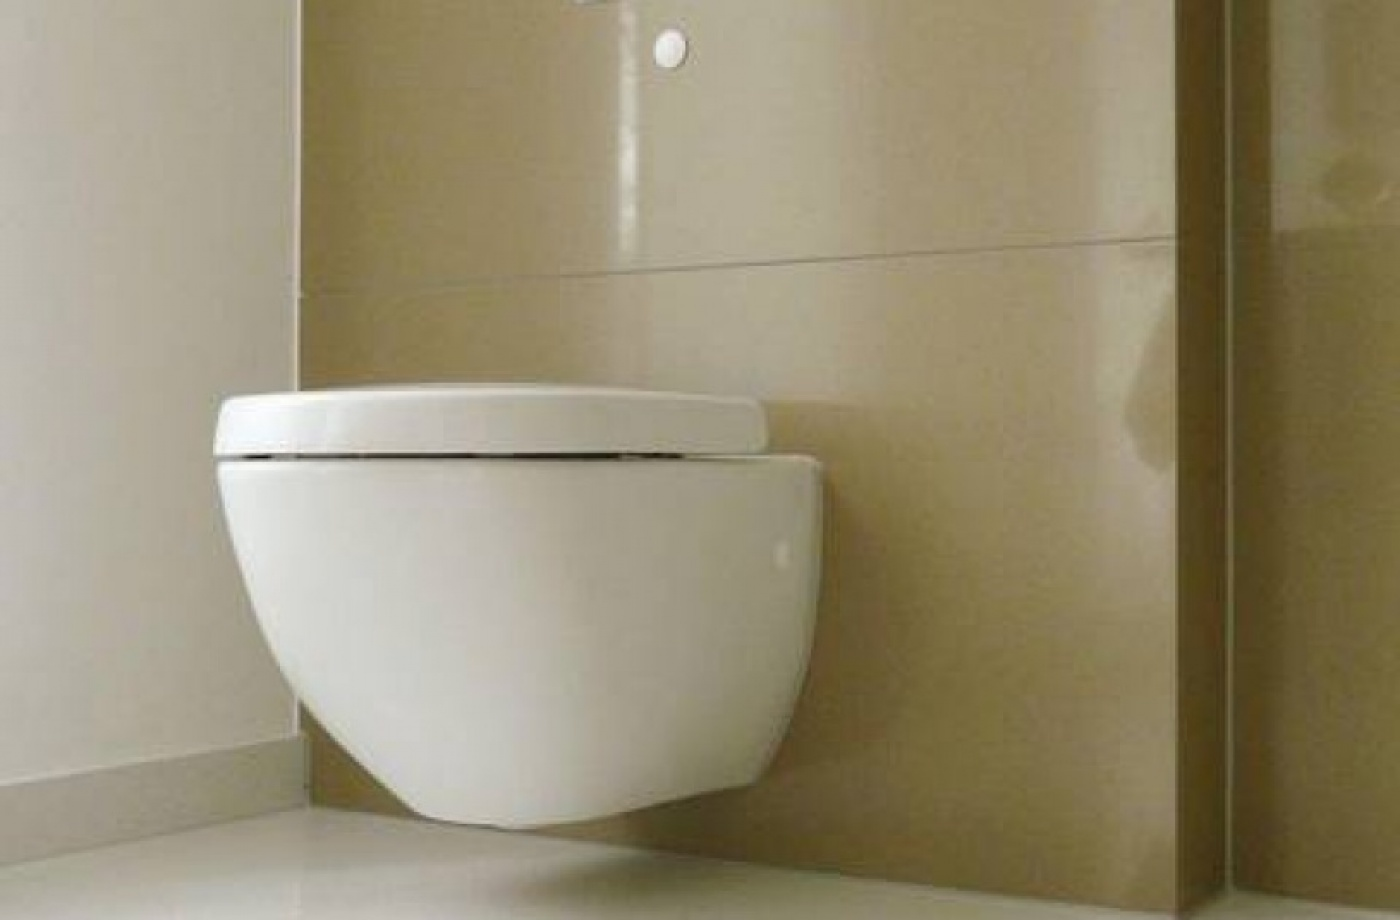 Habillage toilettes en Quartz Maron Canela. Wc design Stark